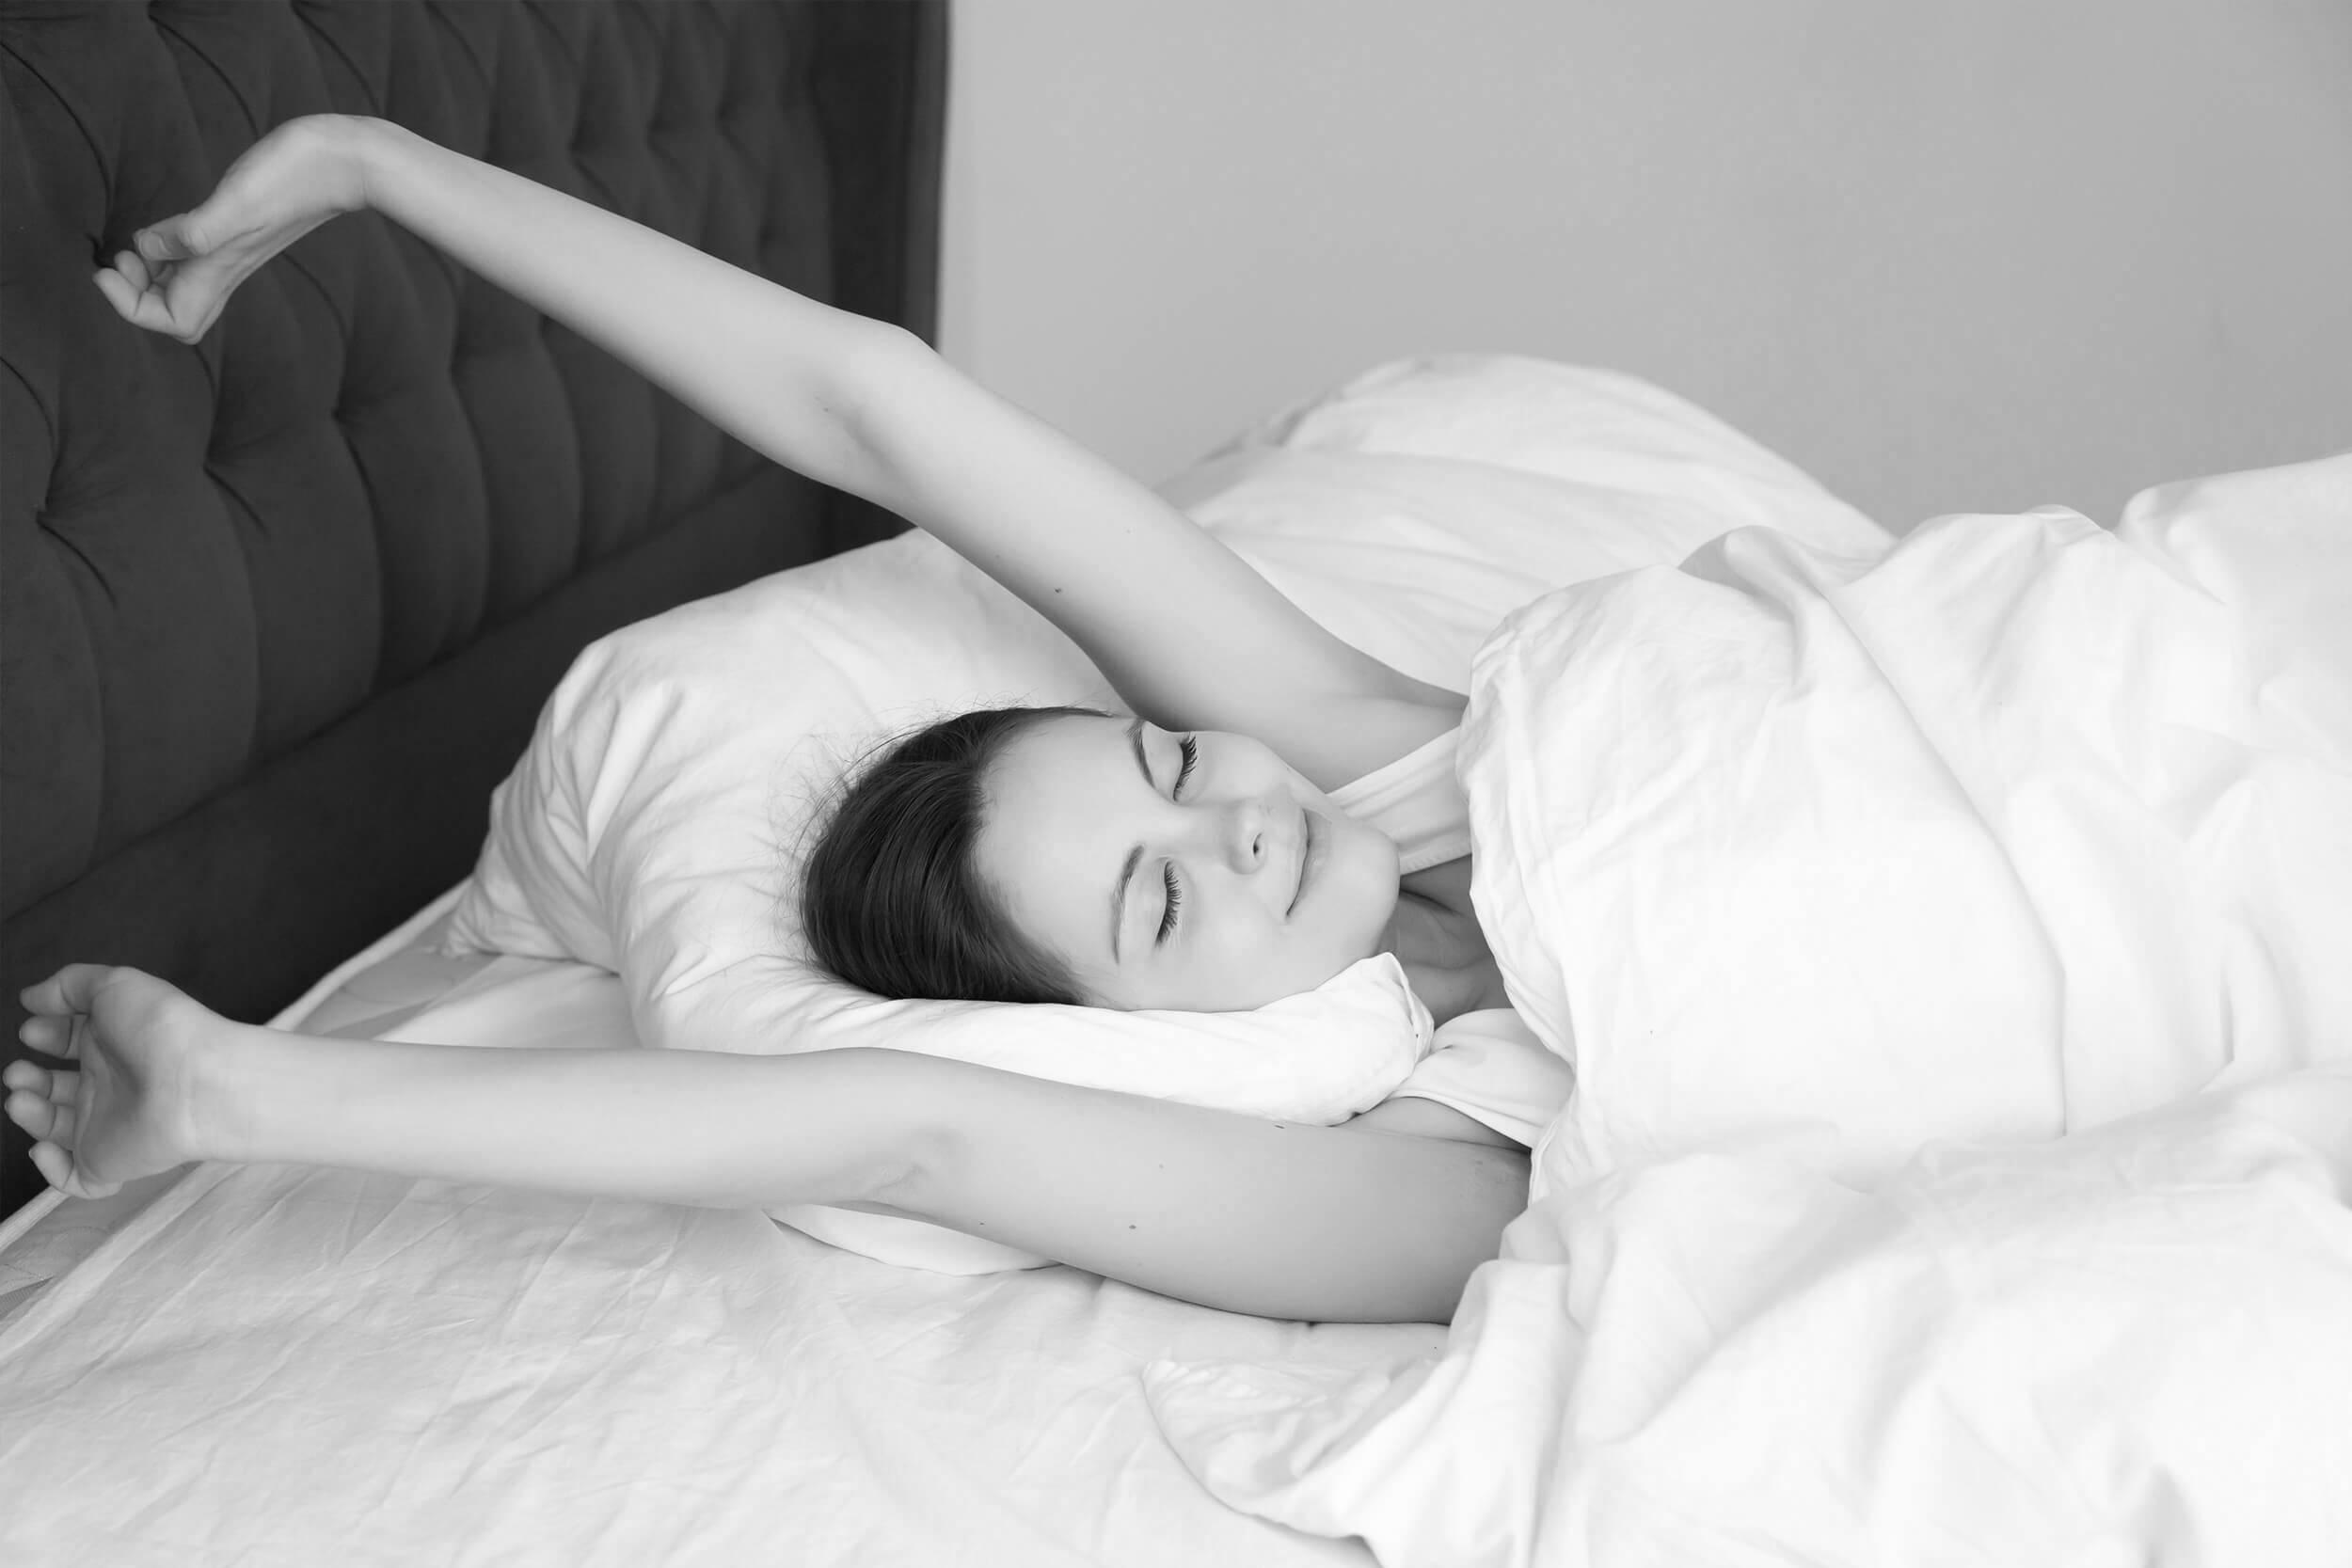 matrac-spánok